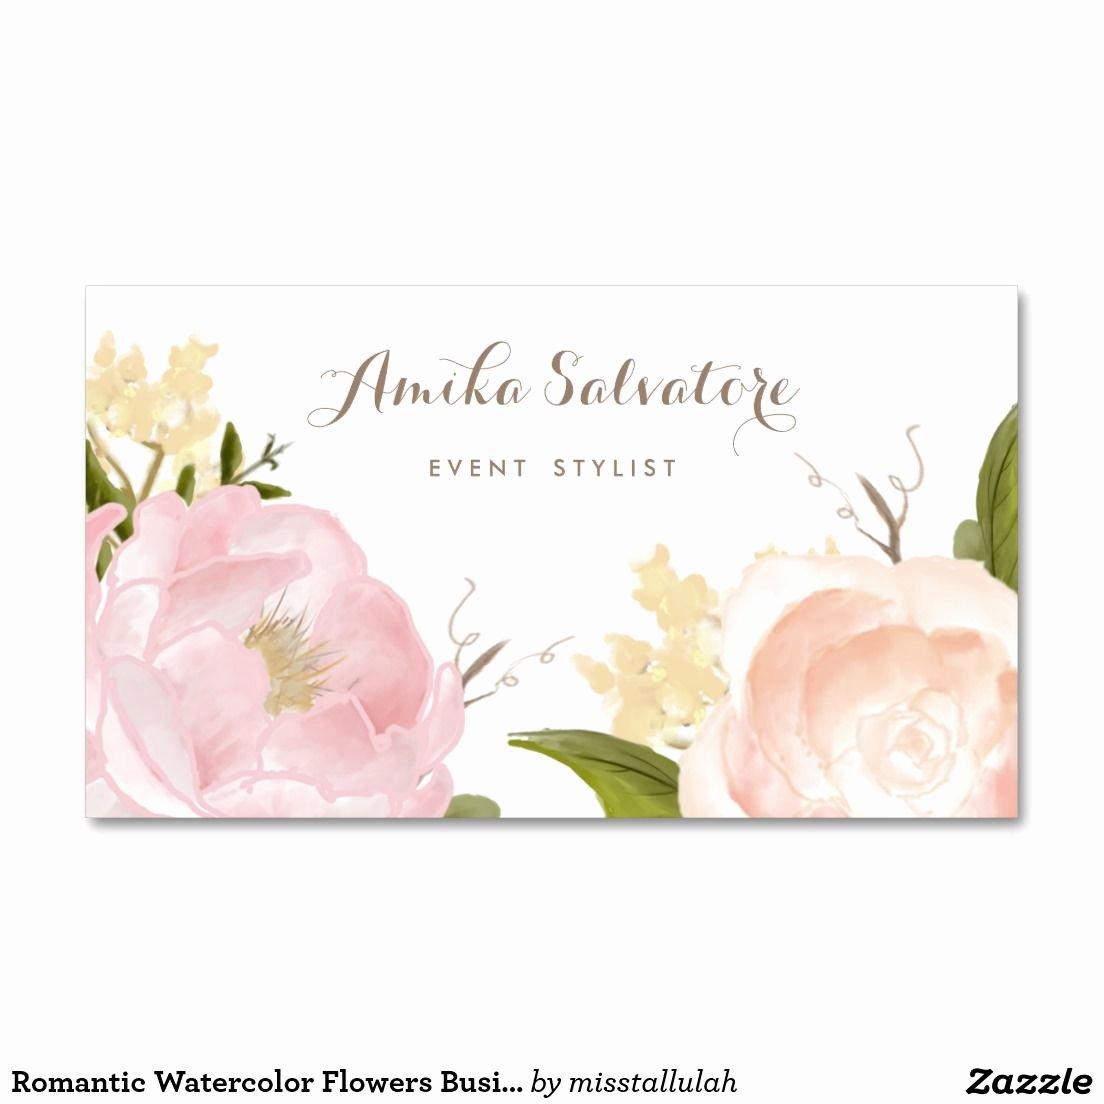 Florist Business Cards Design Fresh Romantic Watercolor Flowers Business Card